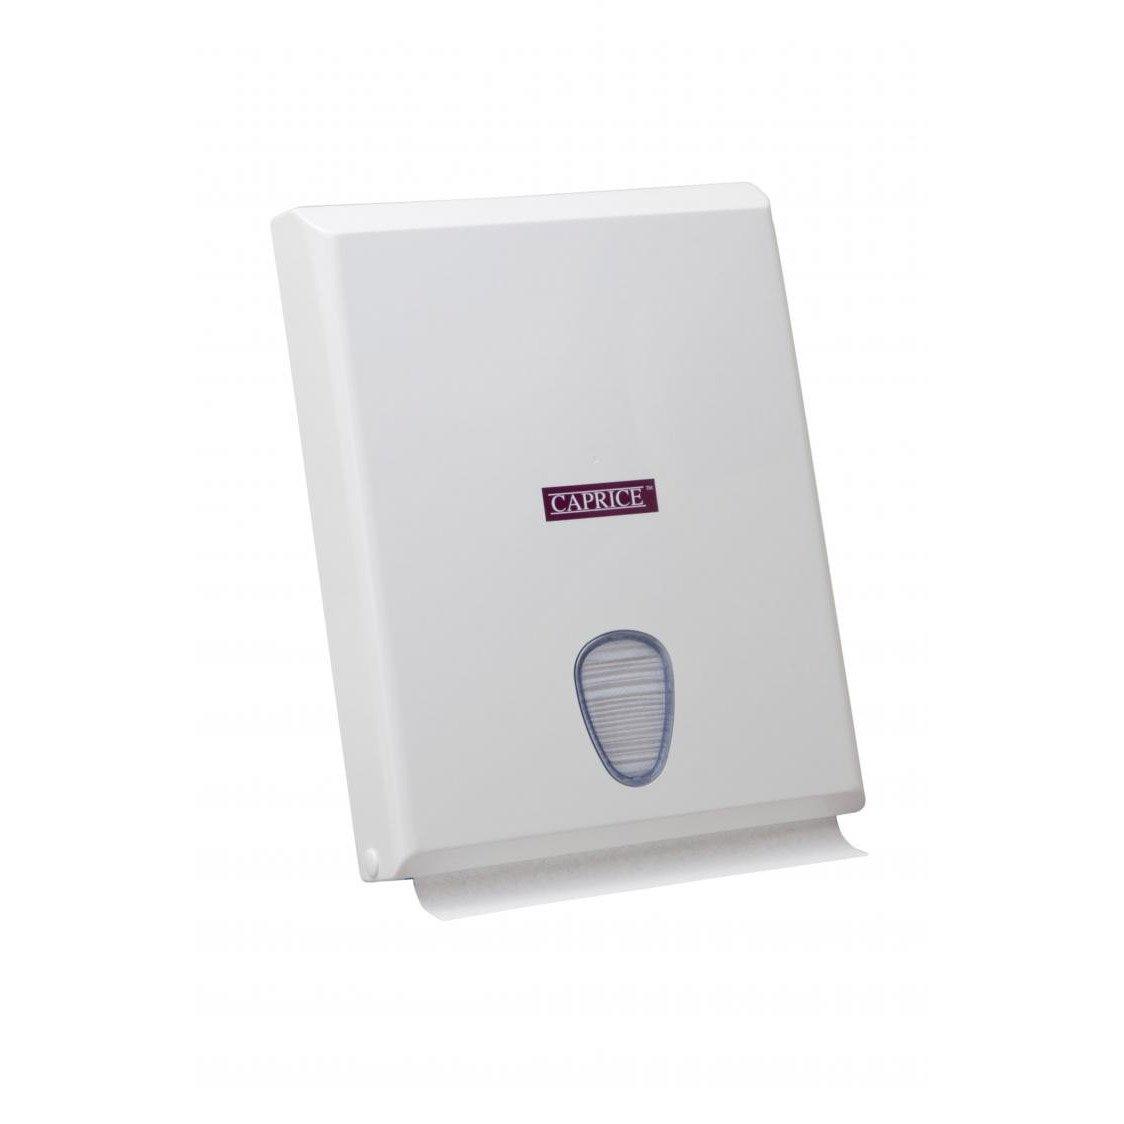 Caprice Compact Towel Dispenser